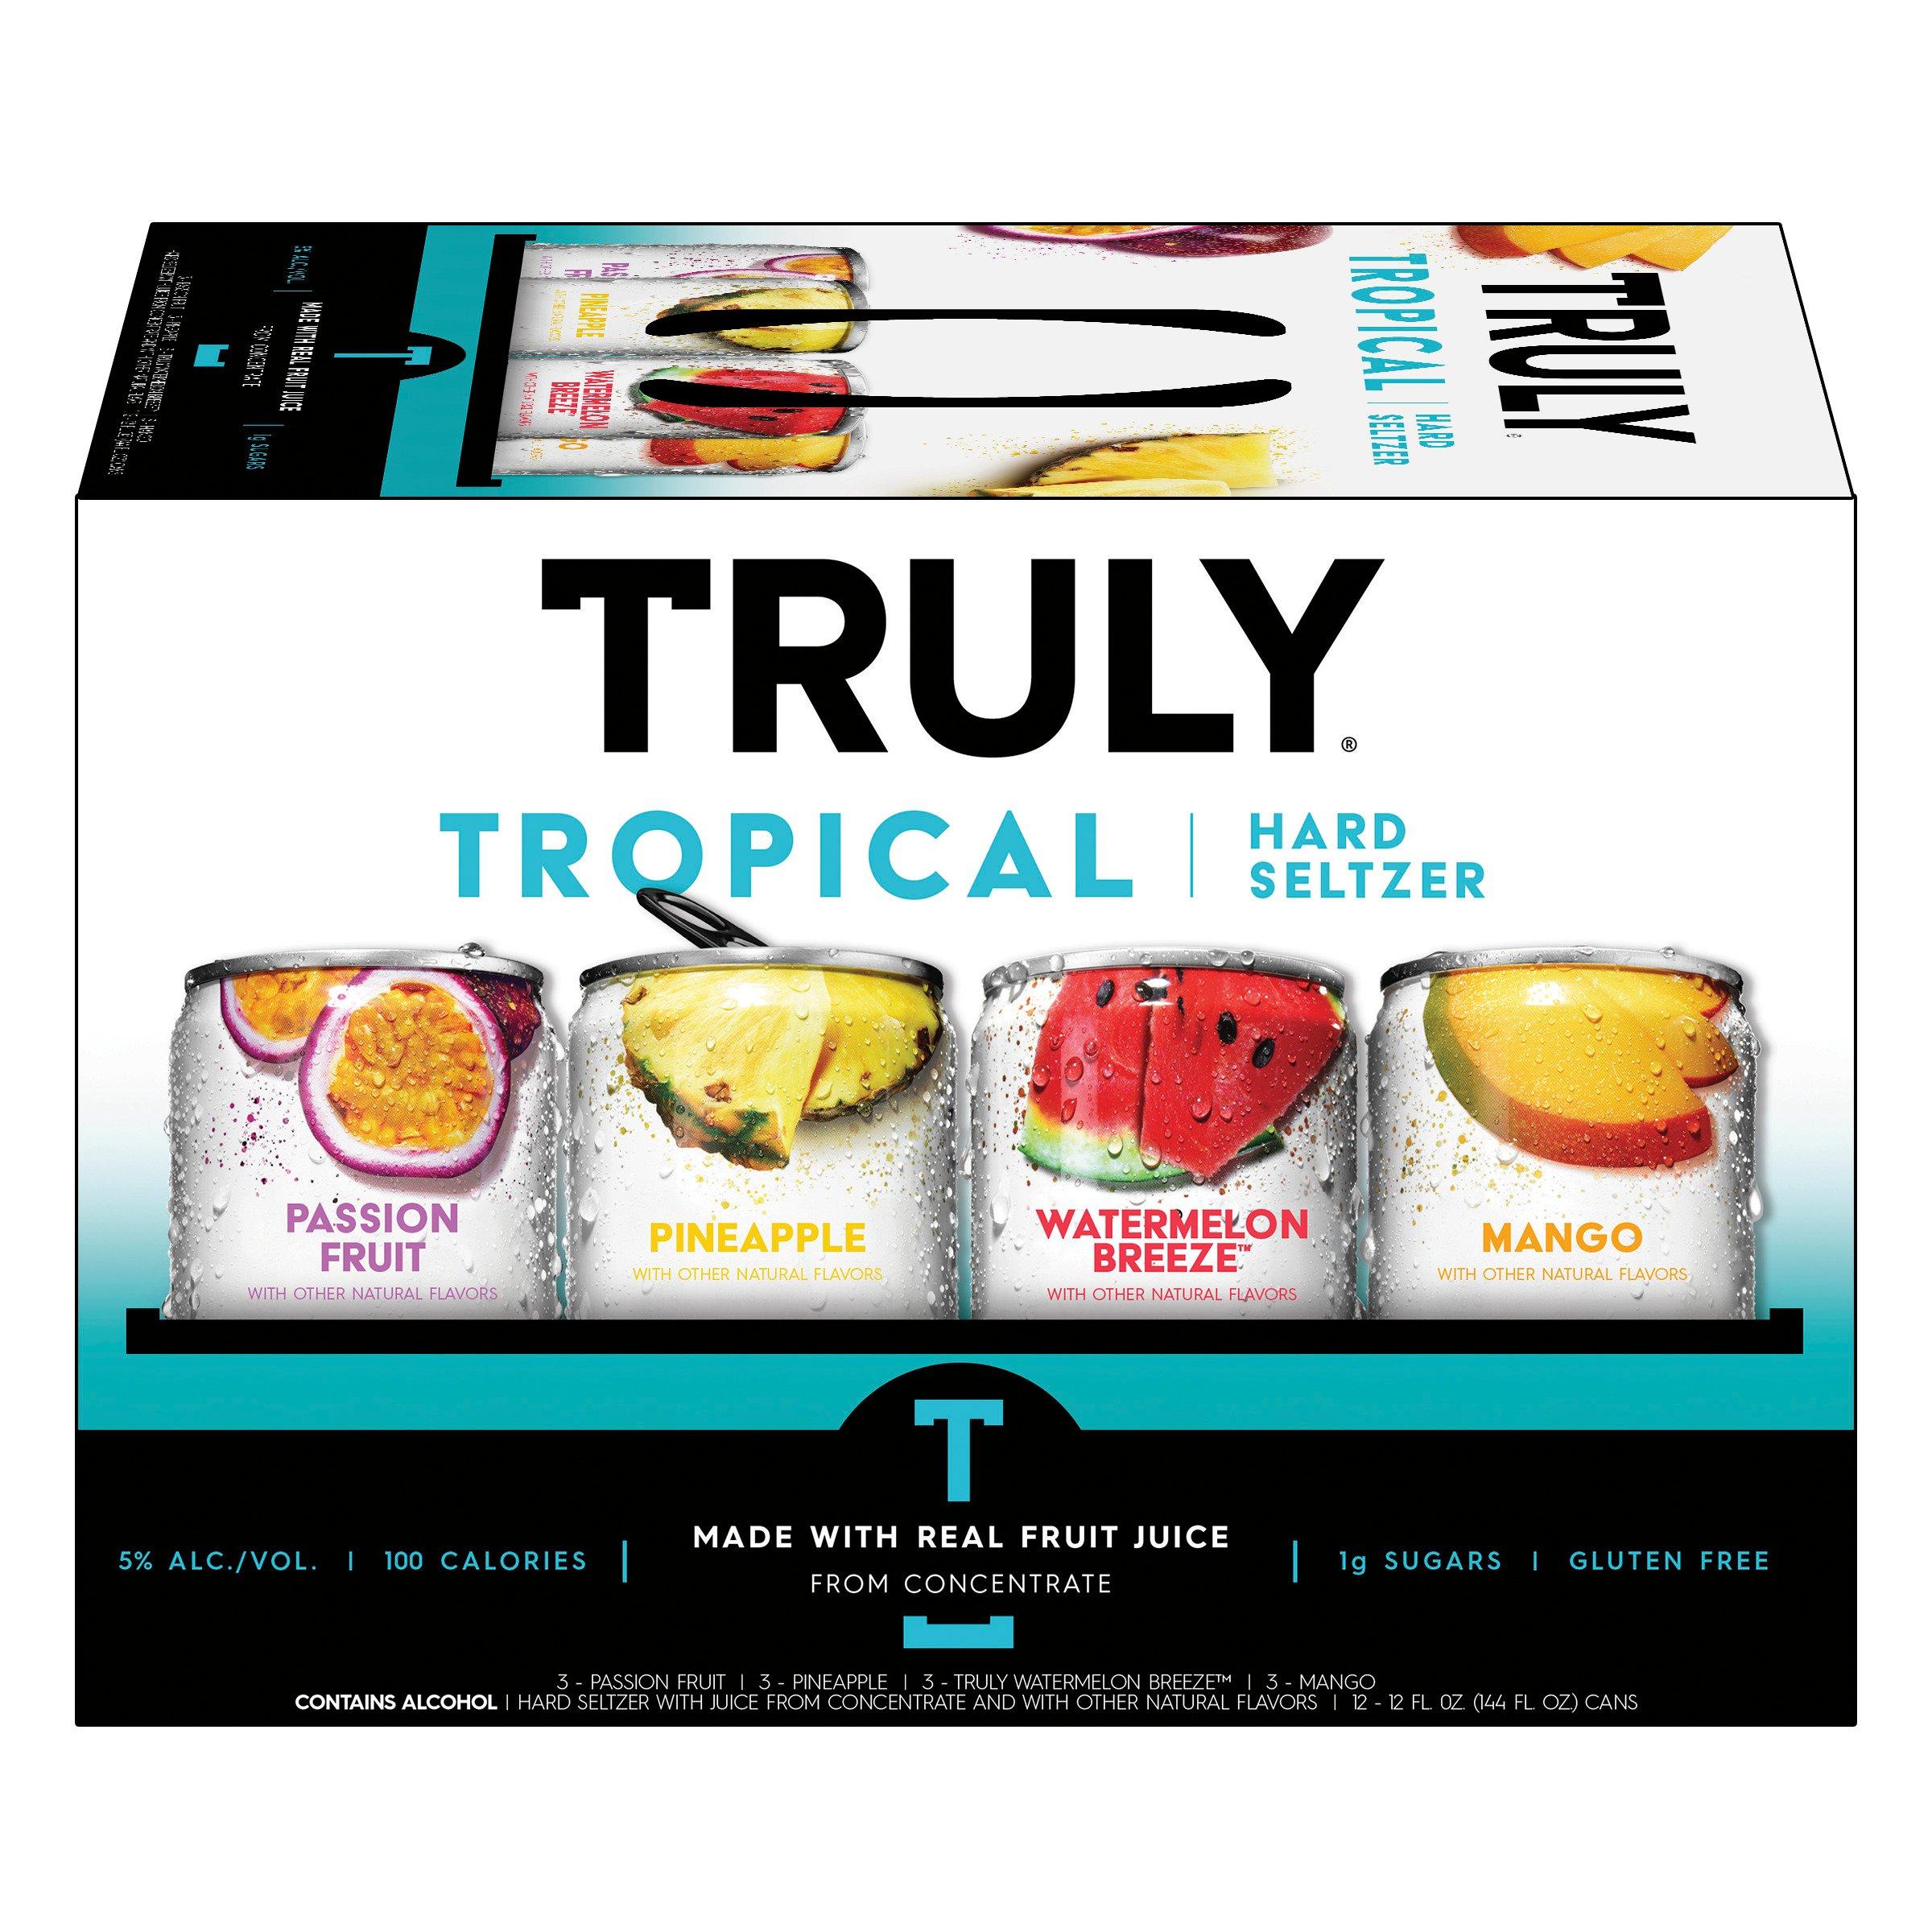 Truly Hard Seltzer Tropical Mix Pack 12 oz Cans - Shop Malt Beverages &  Coolers at H-E-B